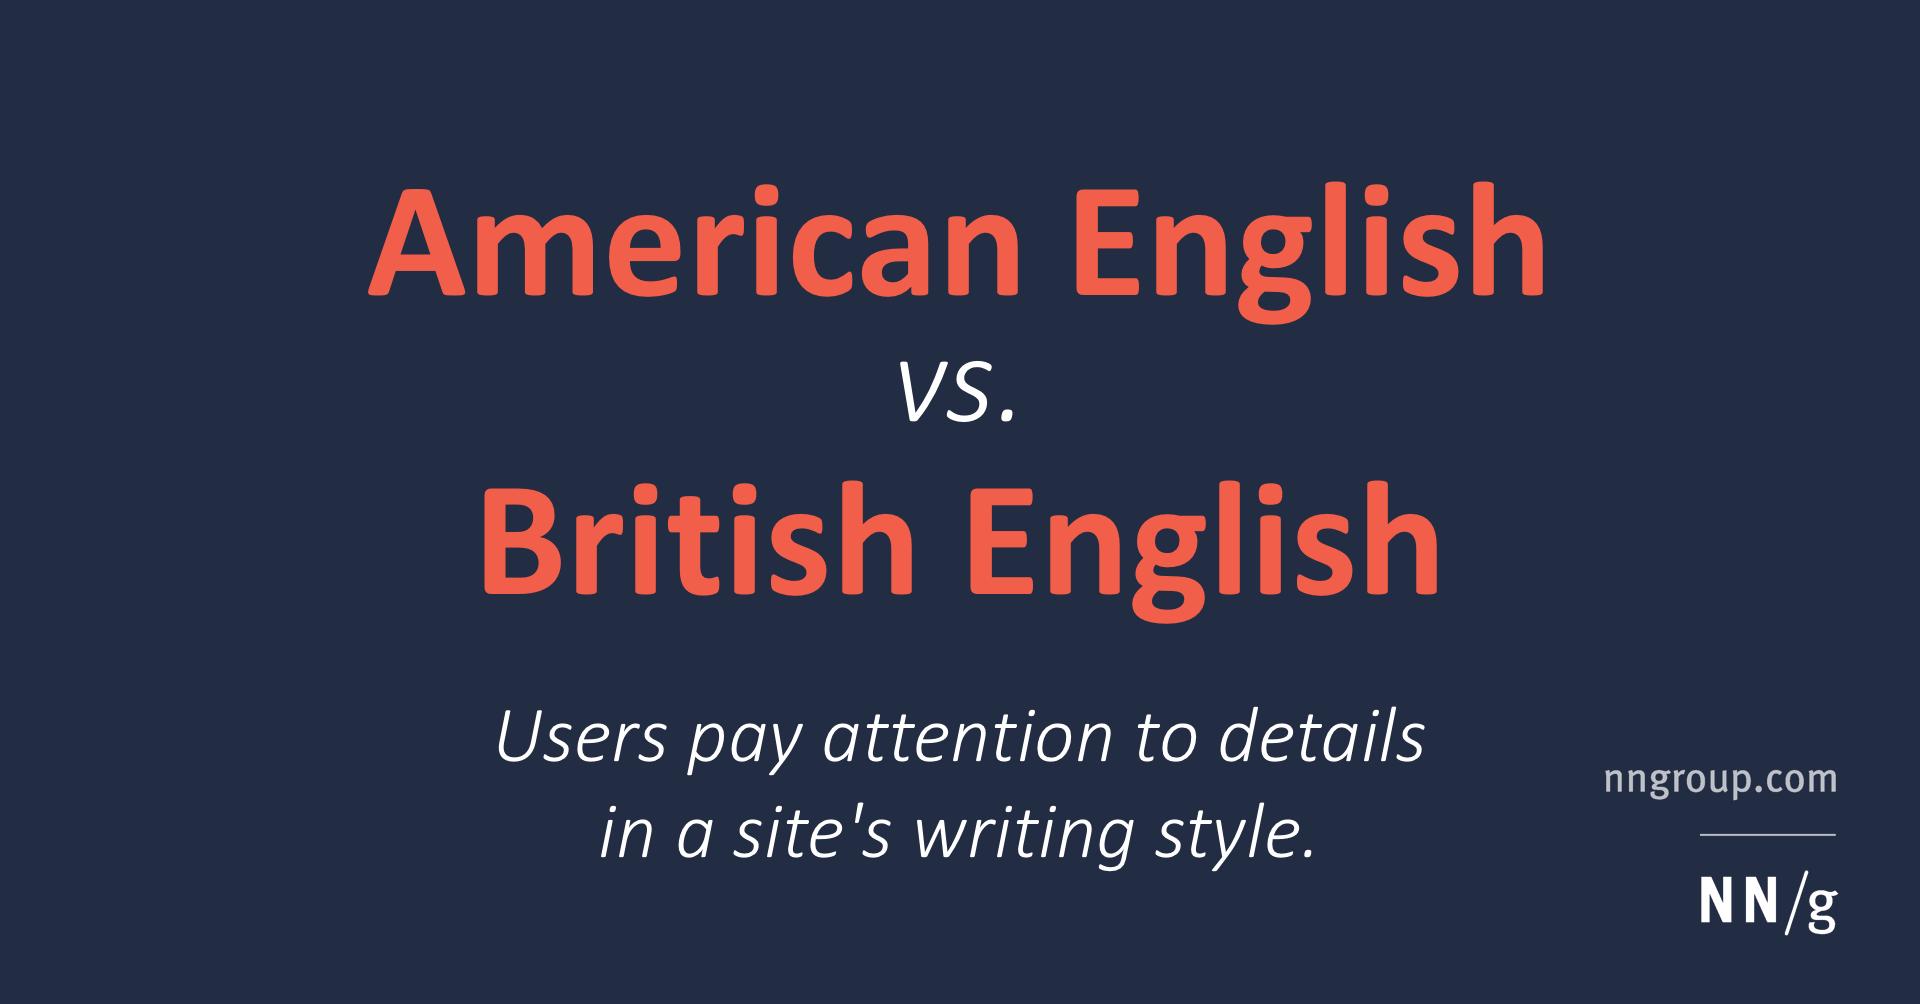 American English vs. British English for Web Content